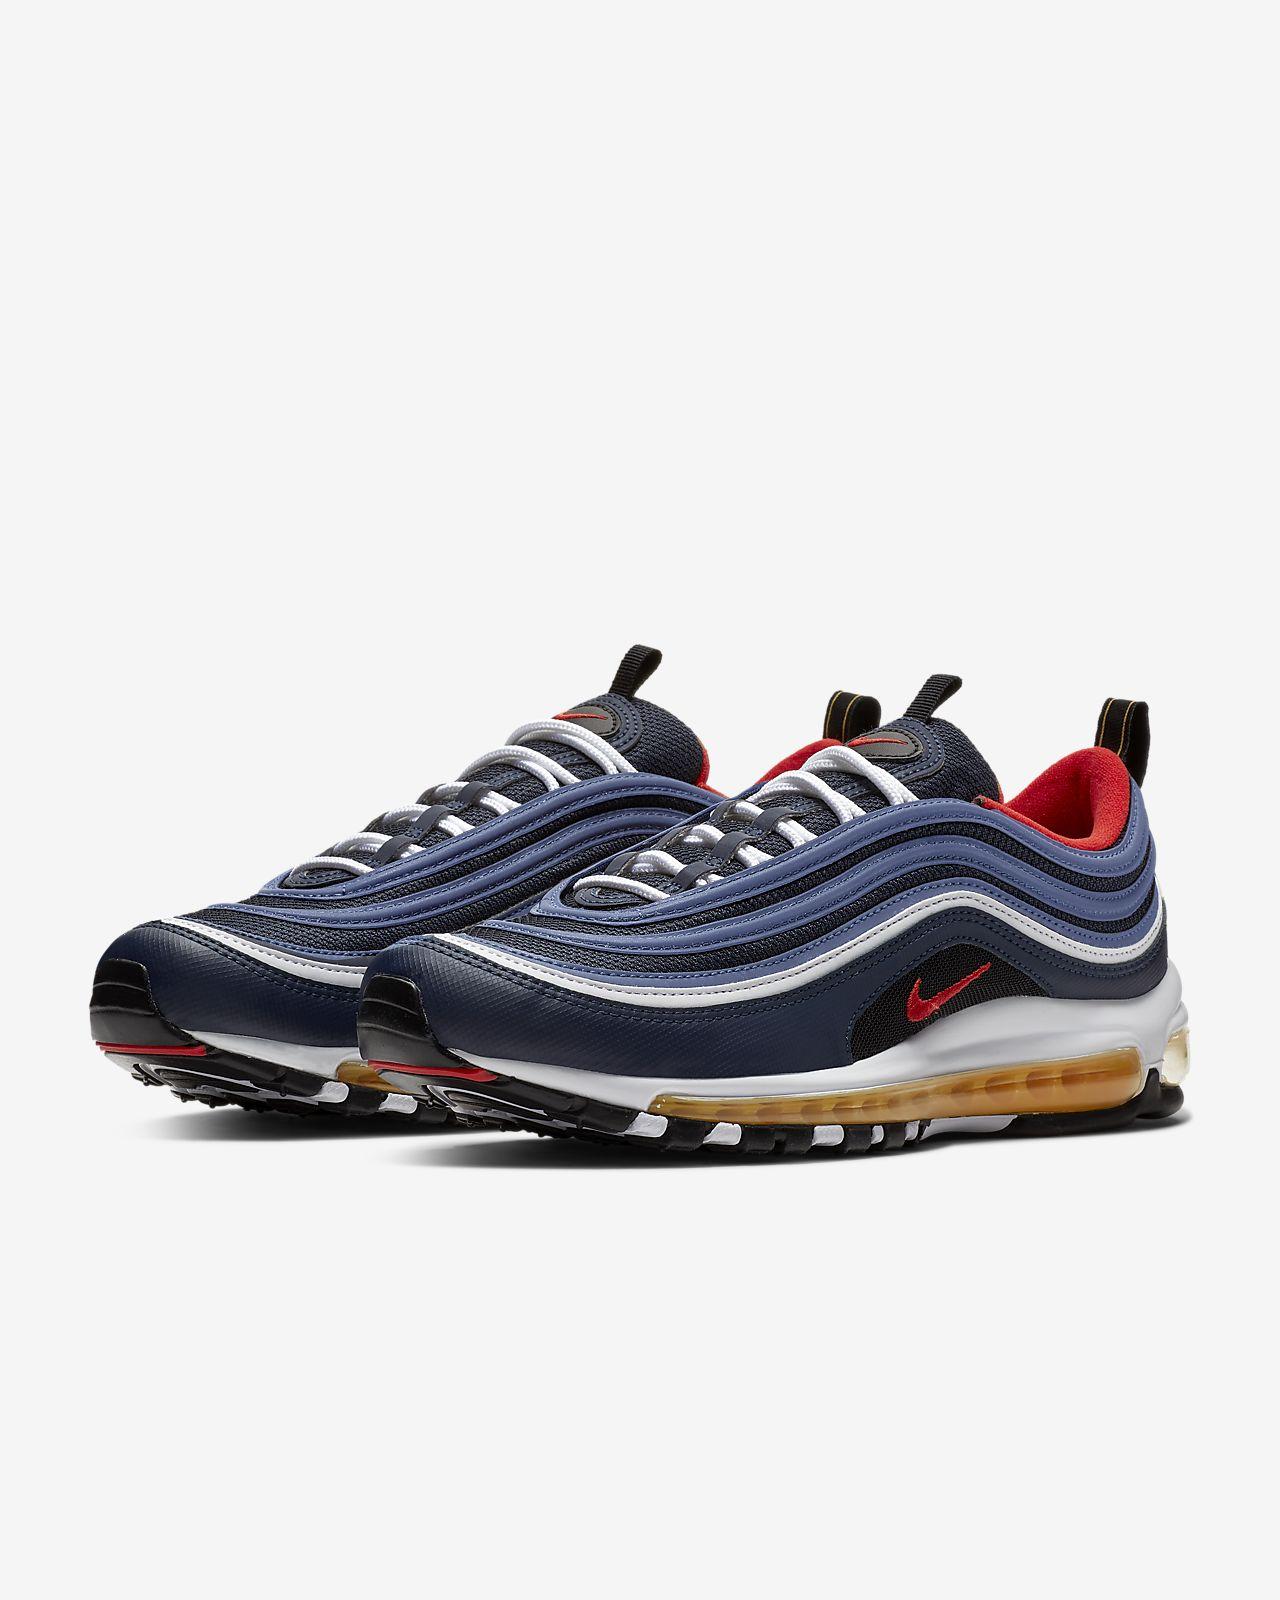 quality design 2ddf6 9b639 ... Chaussure Nike Air Max 97 pour Homme